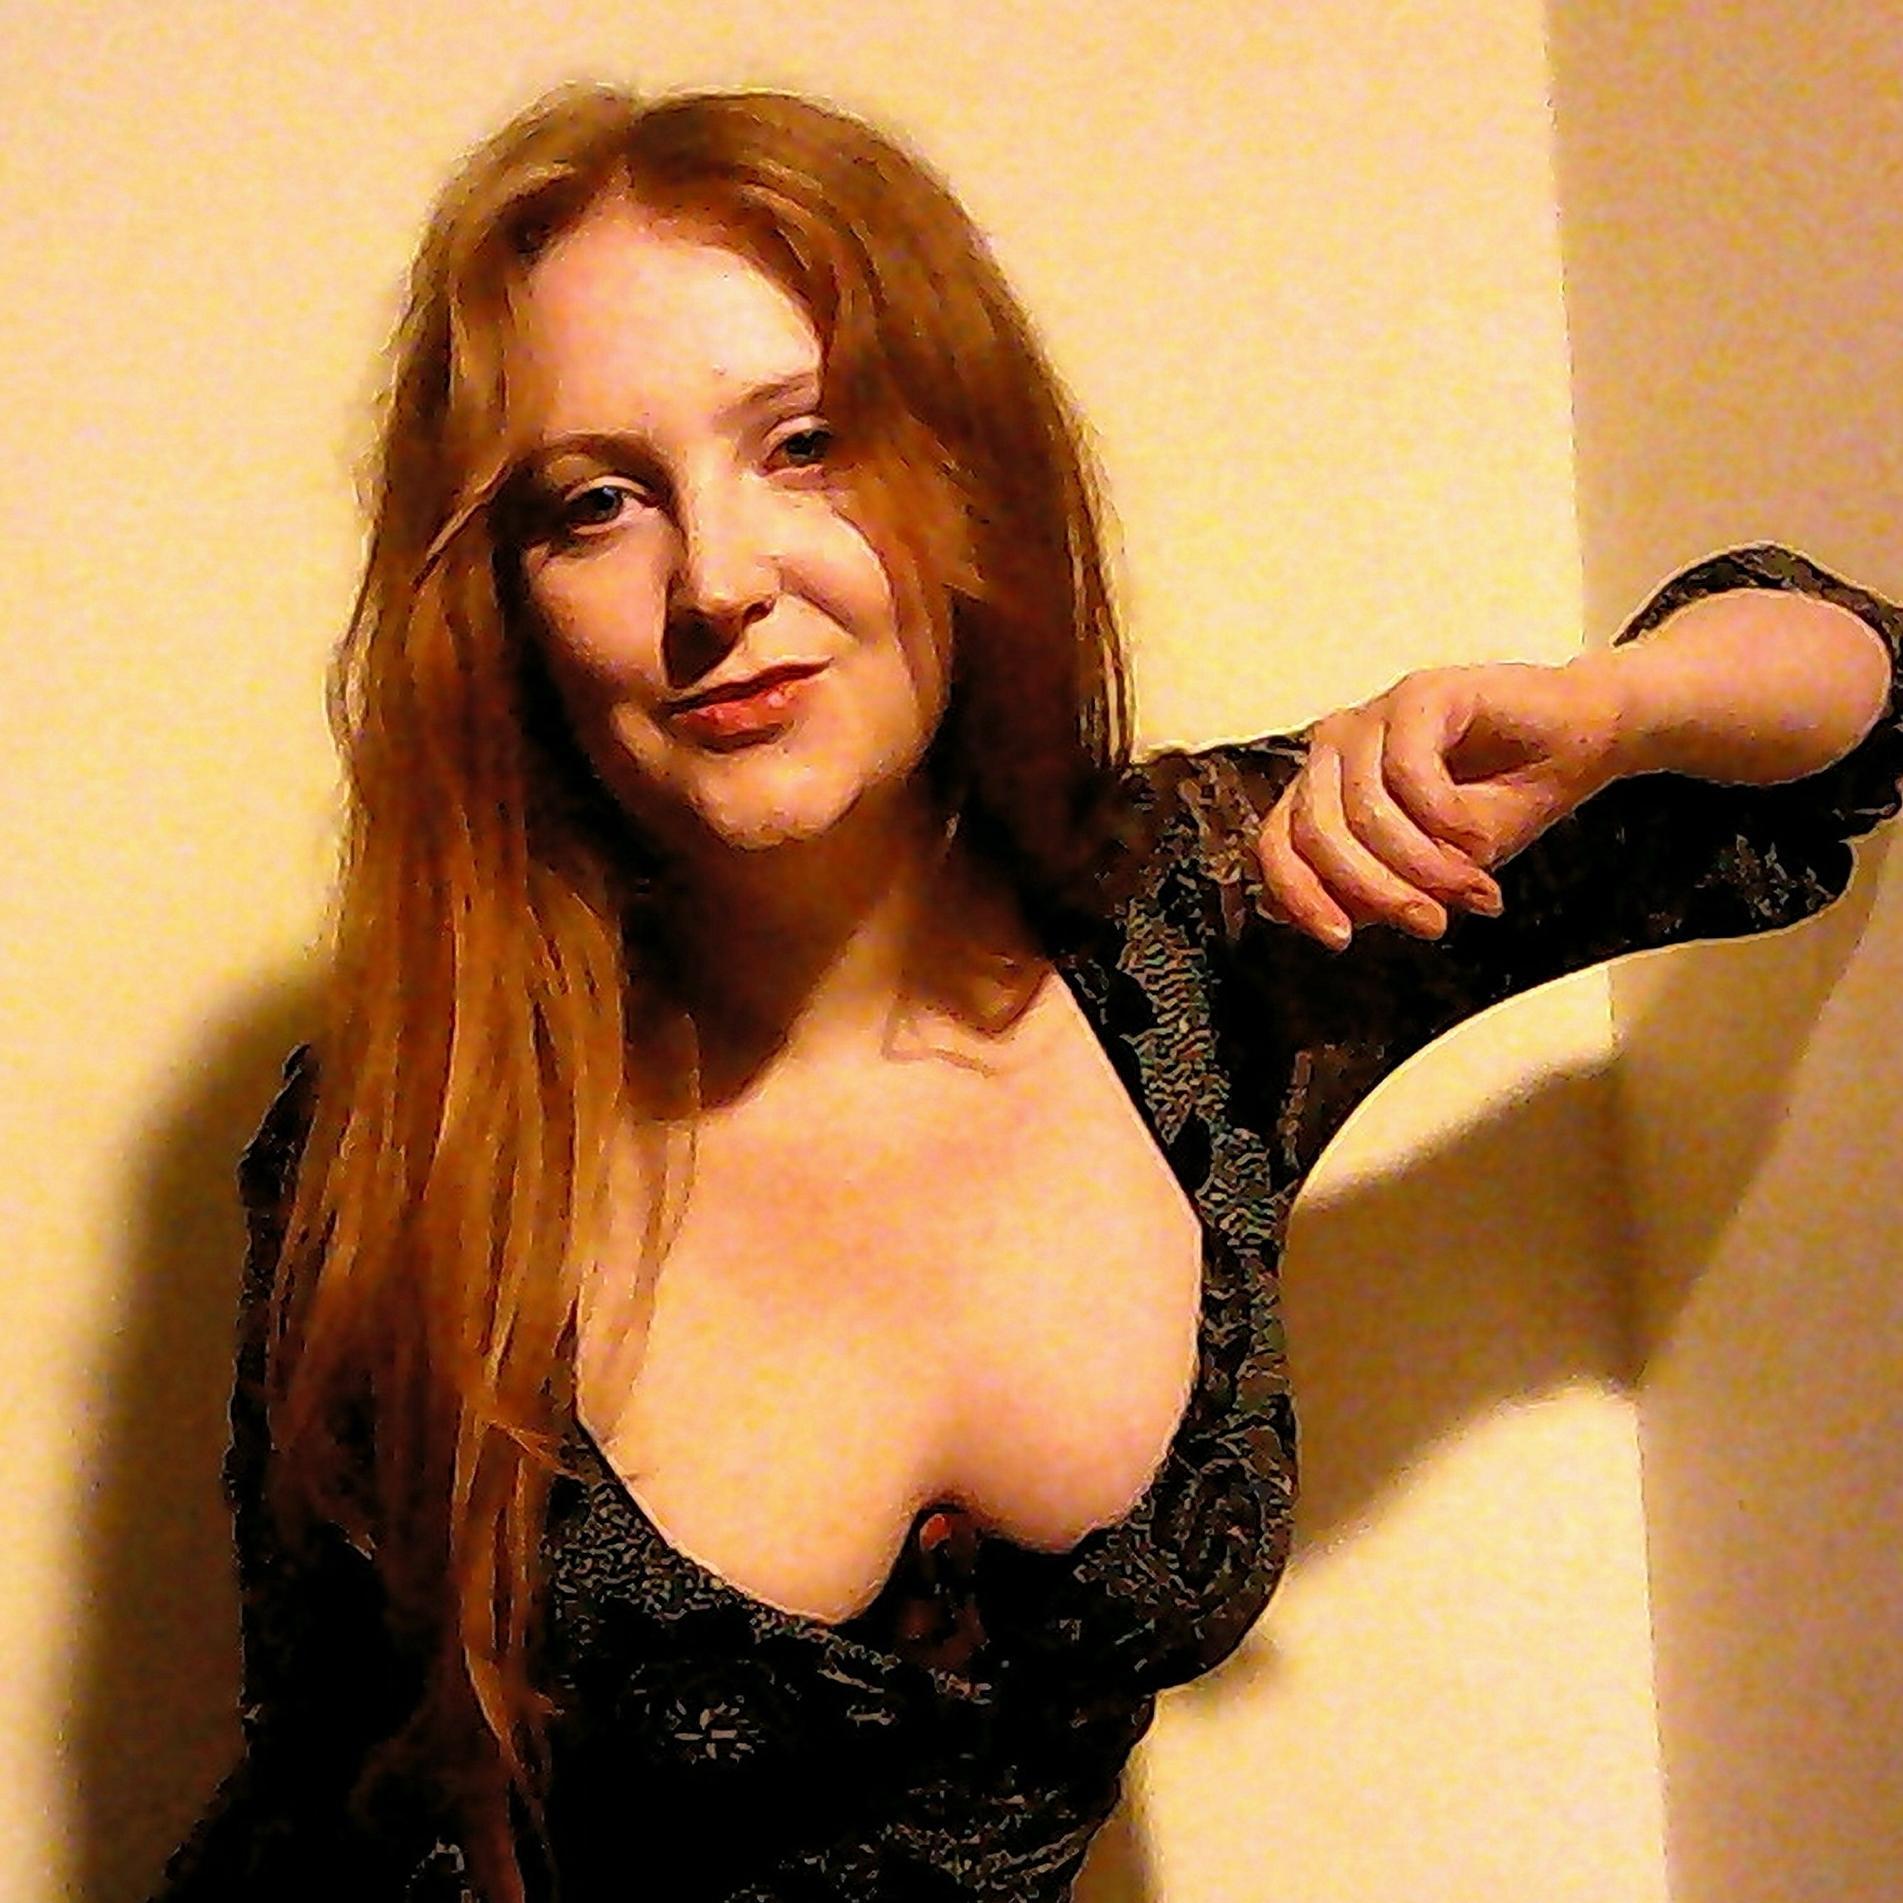 older sexy hariy woman